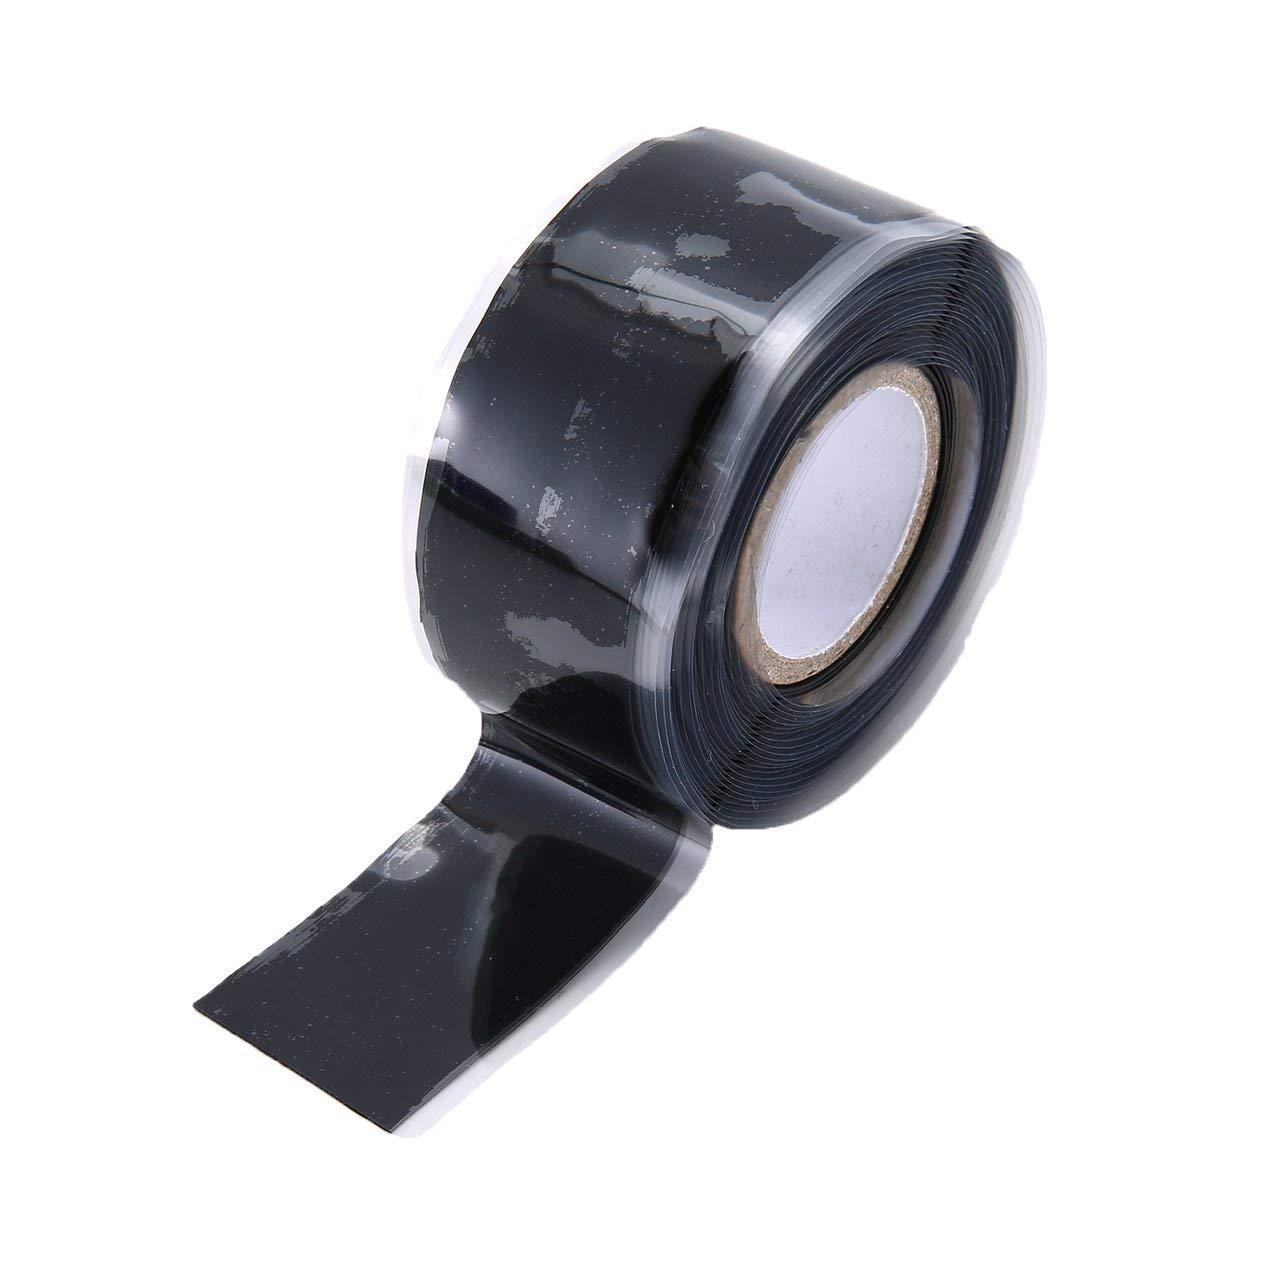 sello silicona alta viscosidad cinta de reparaci/ón herramienta de rescate tubo de agua autoadhesiva cinta de reparaci/ón autoflujo 2.5 * 300 CM Impermeable banda